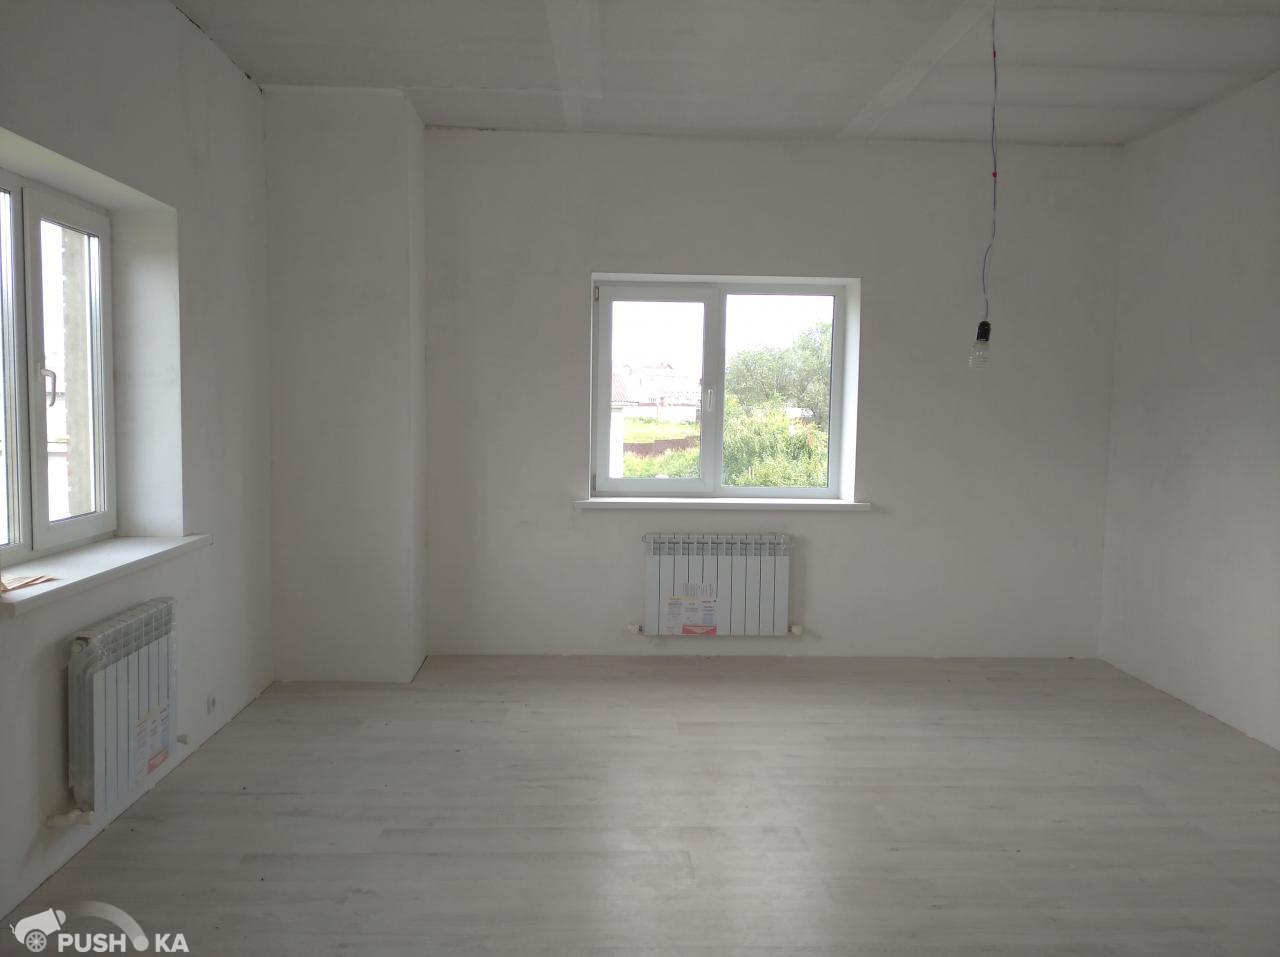 Продаётся  дом/дача 243.8 кв.м.  за 13 000 000 руб